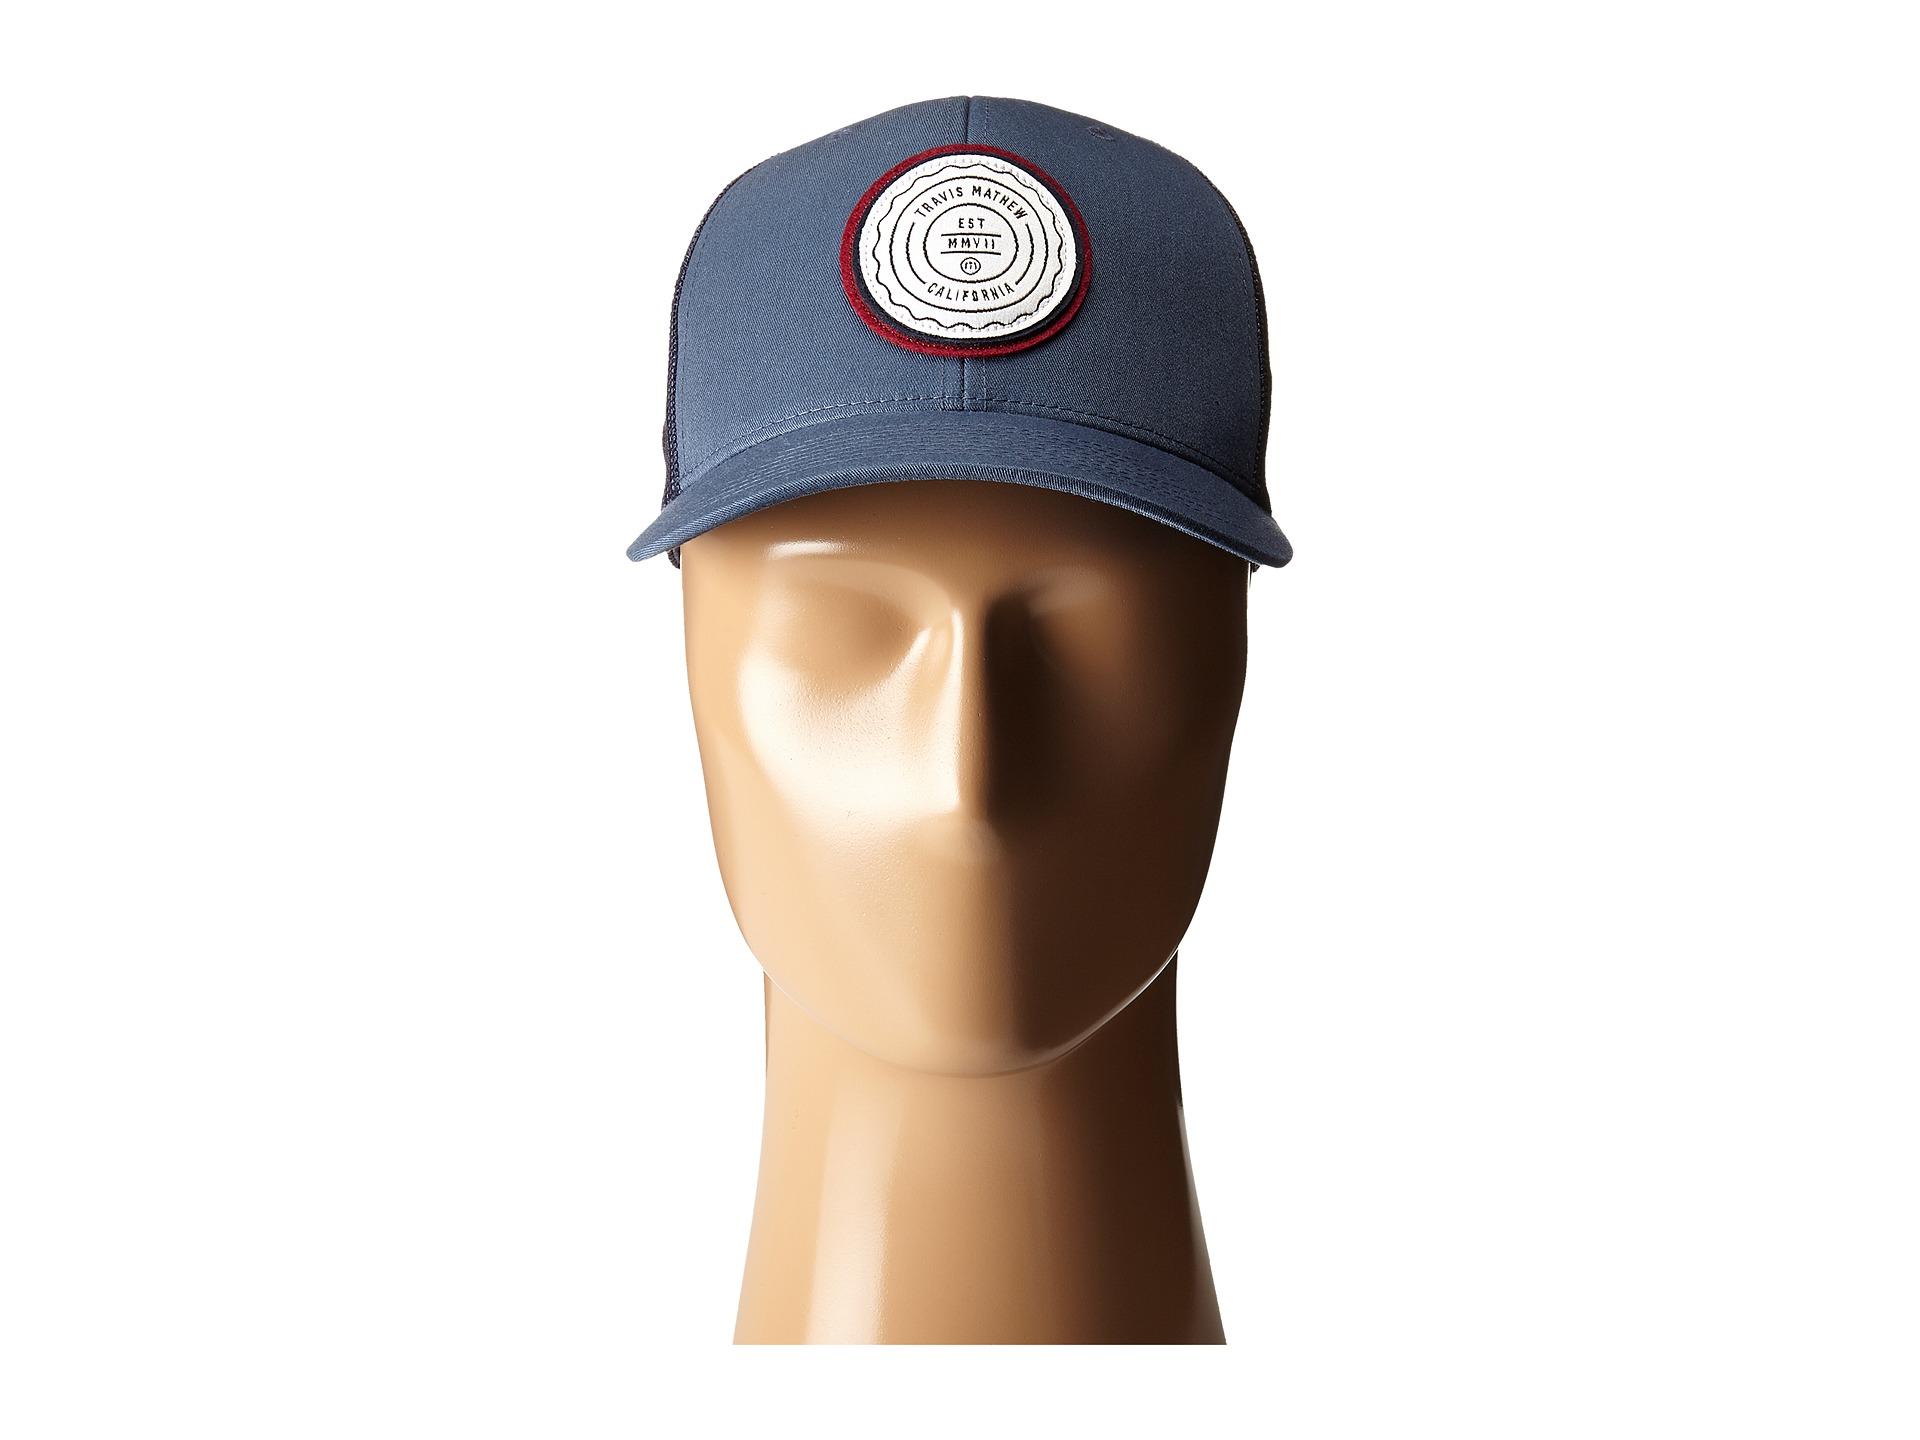 Lyst - Travis Mathew Fringe Hat in Blue for Men 8bb787a1d7b0